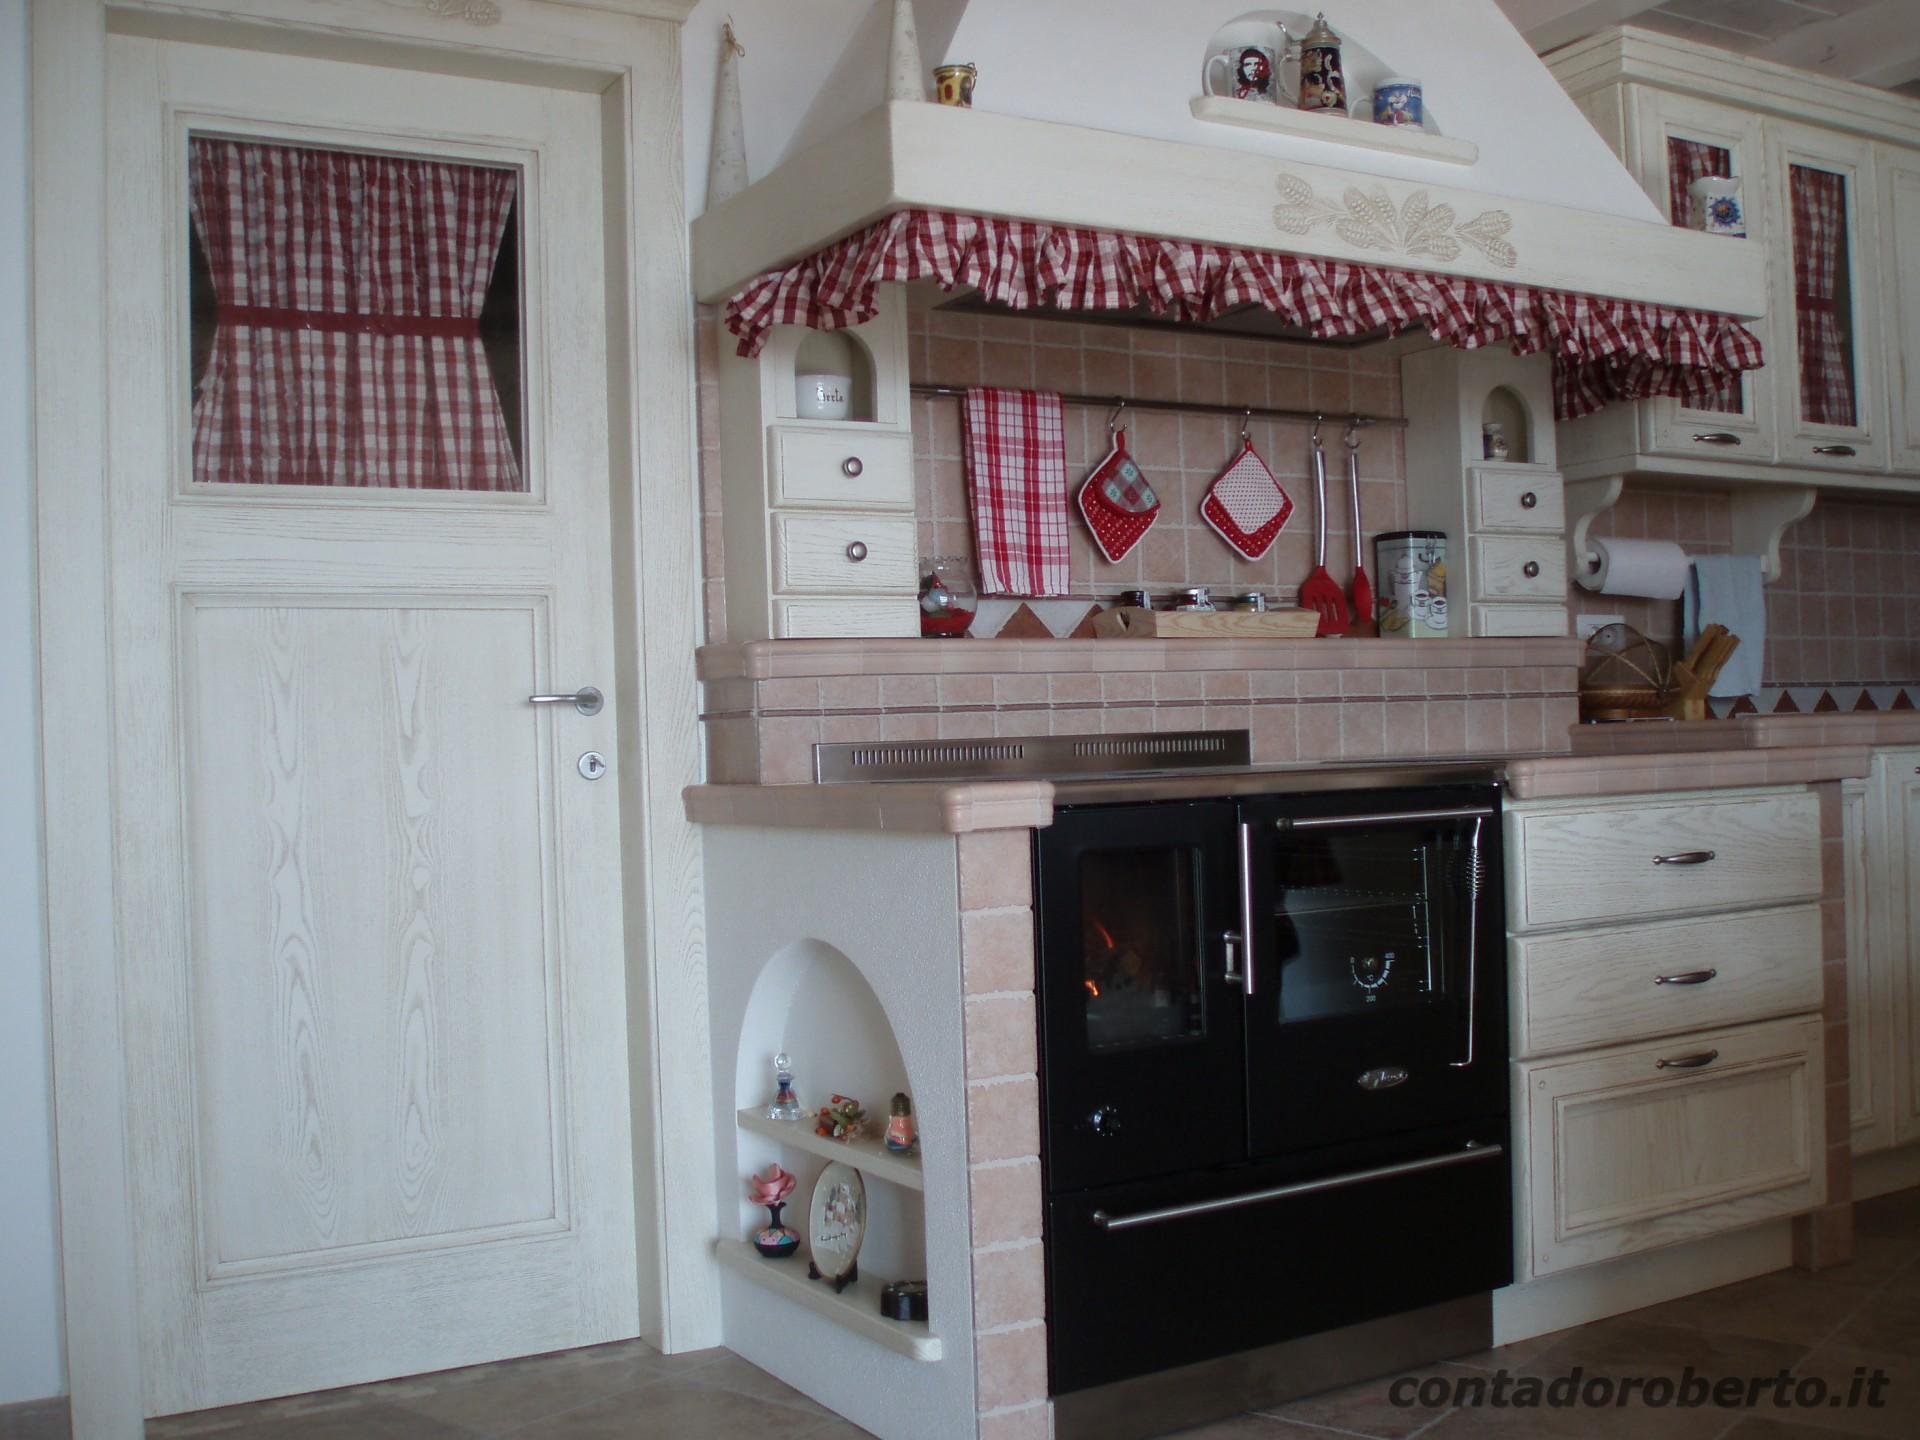 Cucina in Muratura Sotto Soppalco | Contado Roberto Group | Cucine e ...